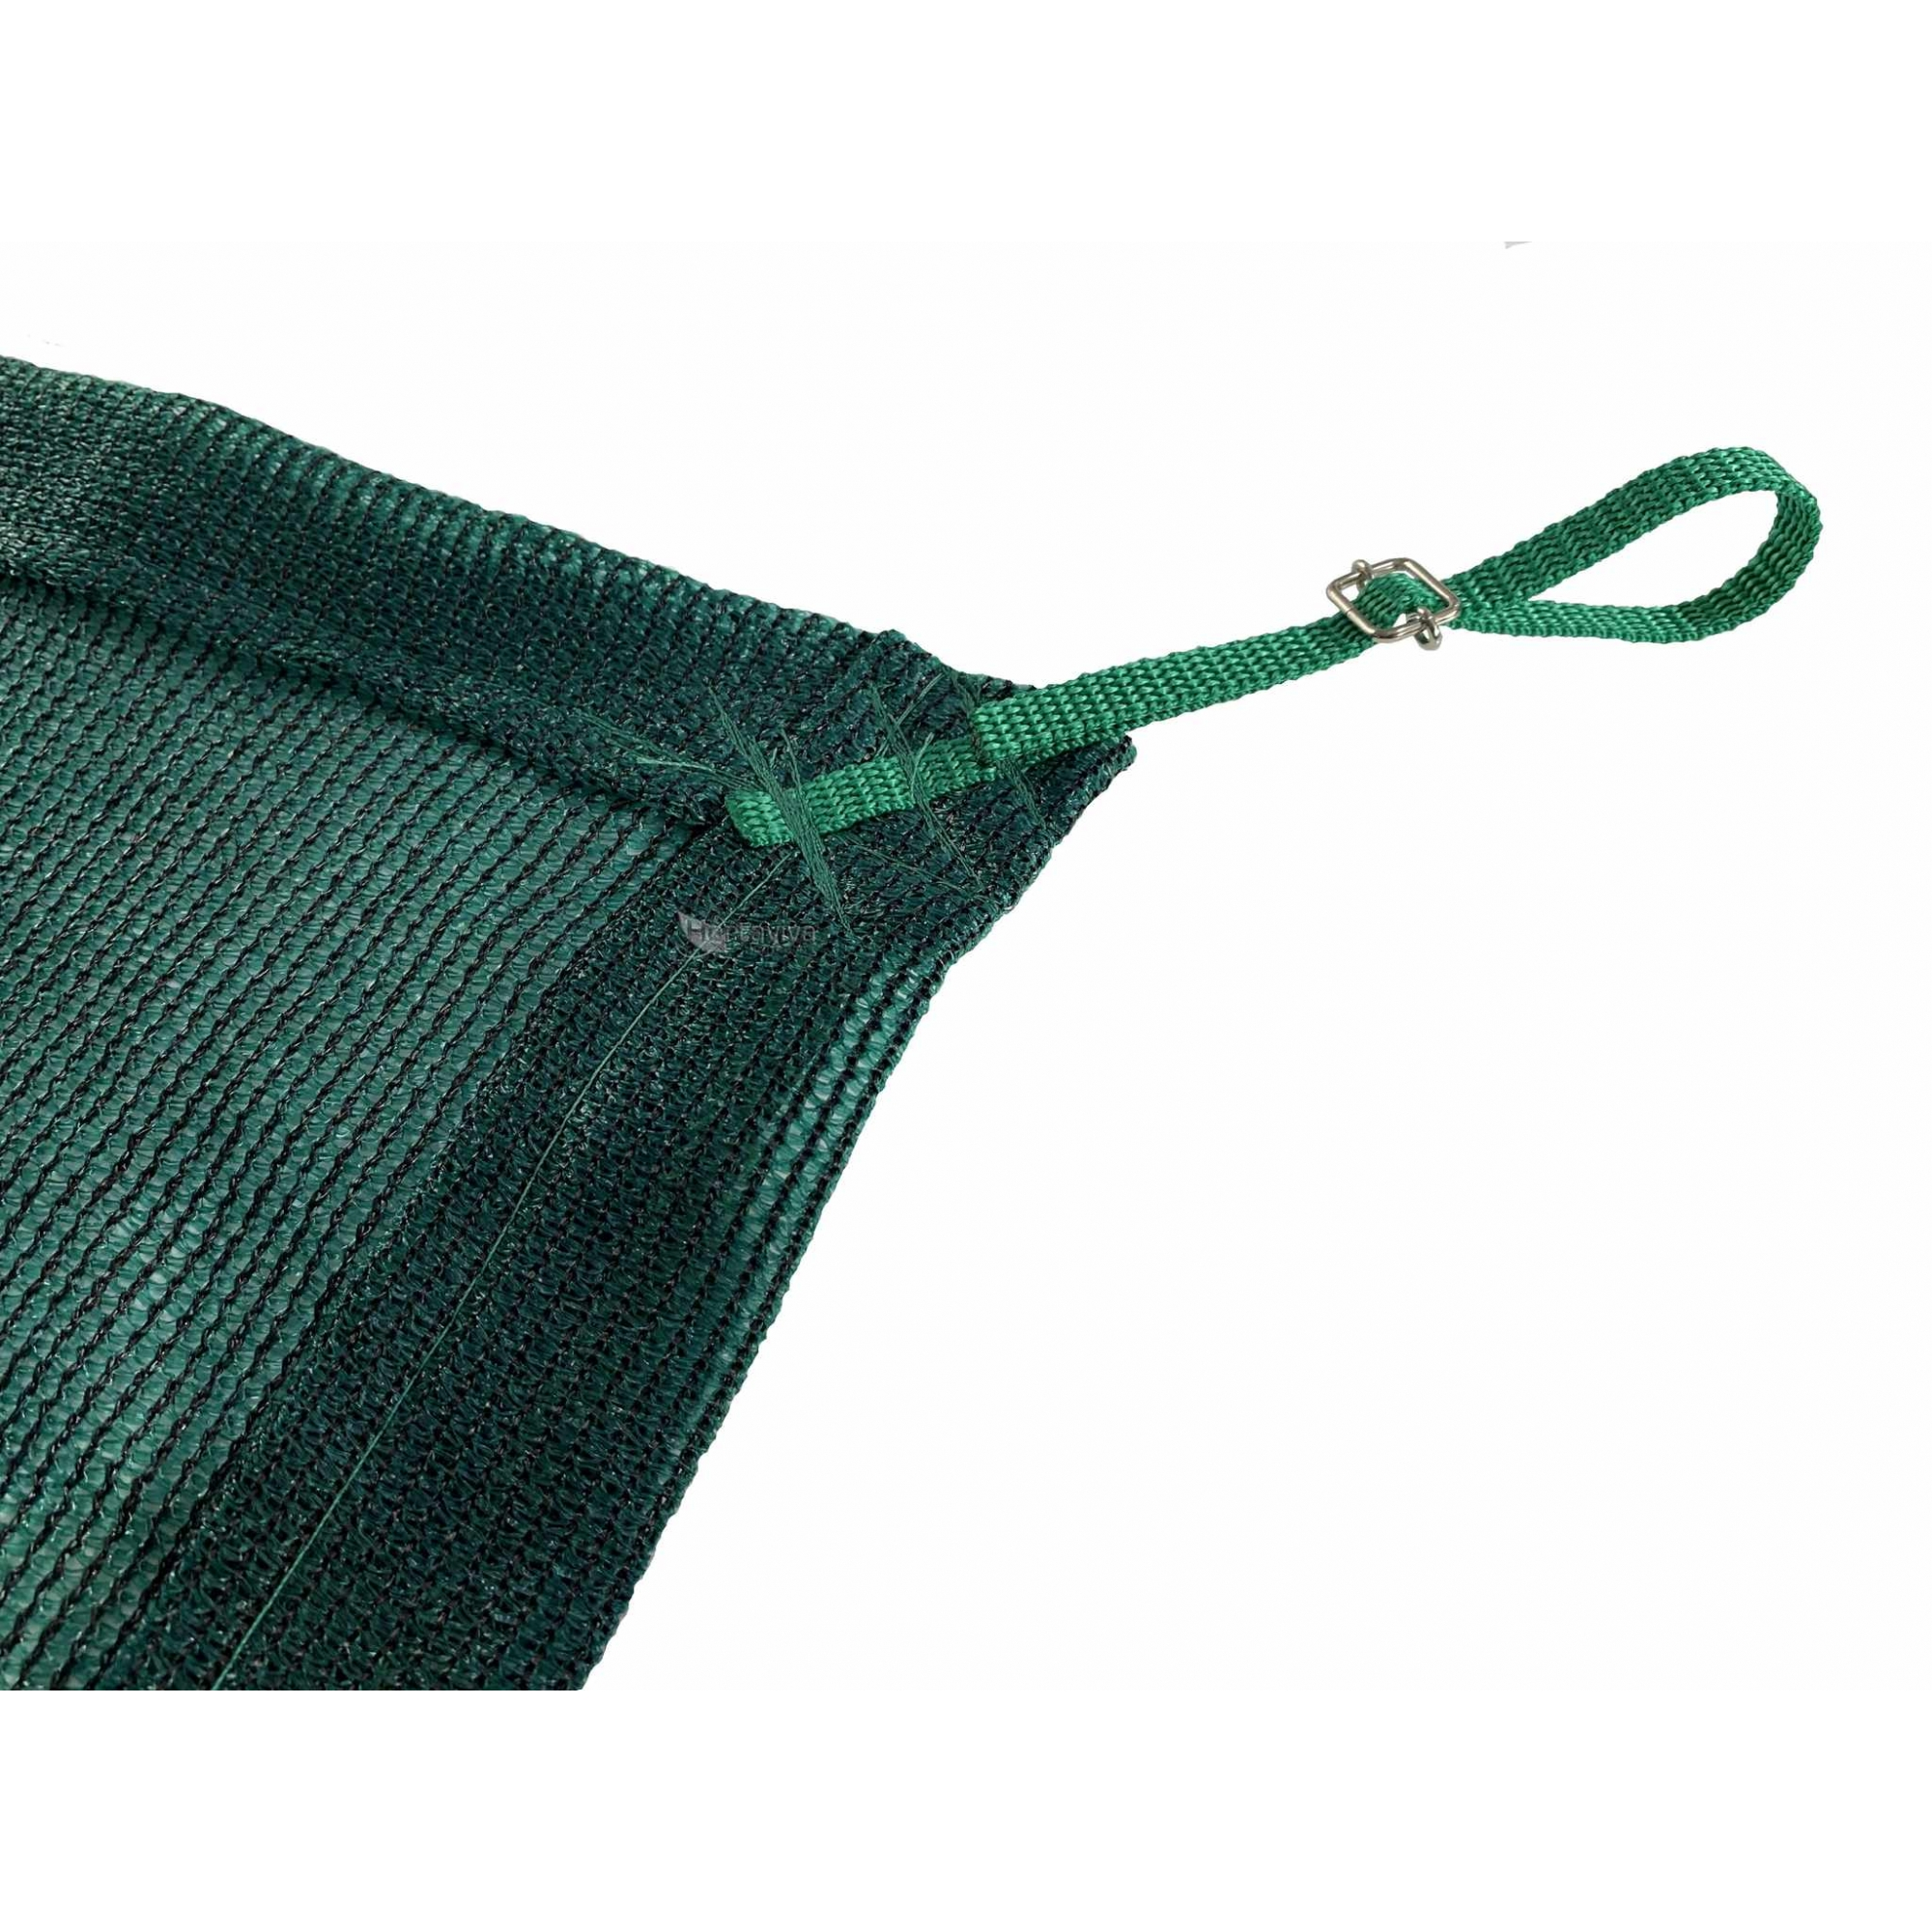 Tela de Sombreamento 80% Verde com Esticadores - Largura: 1 Metro